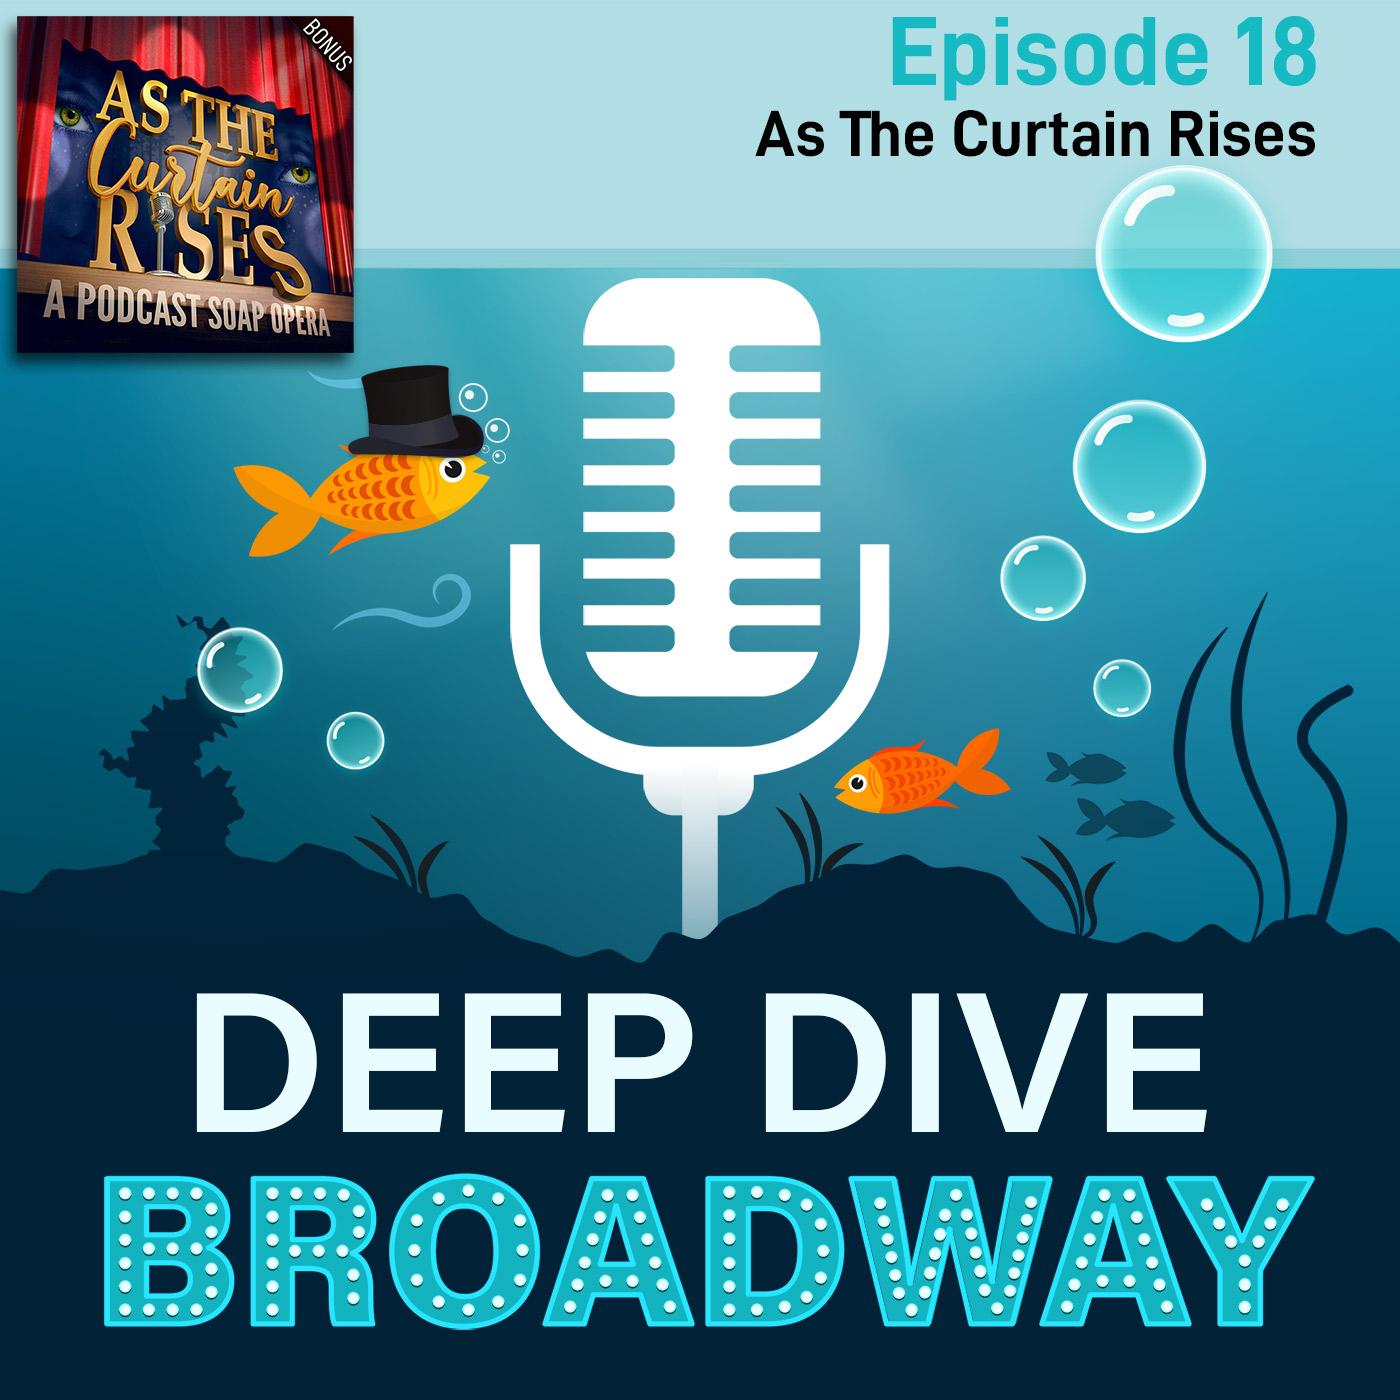 Deep Dive Broadway - #18 - As The Curtain Rises: Alex Brightman, Andrew Barth Feldman, Lesli Margherita, Sarah Stiles, Michael Urie, Lillias White, James Monroe Iglehart, Ramin Karimloo and surprise guests